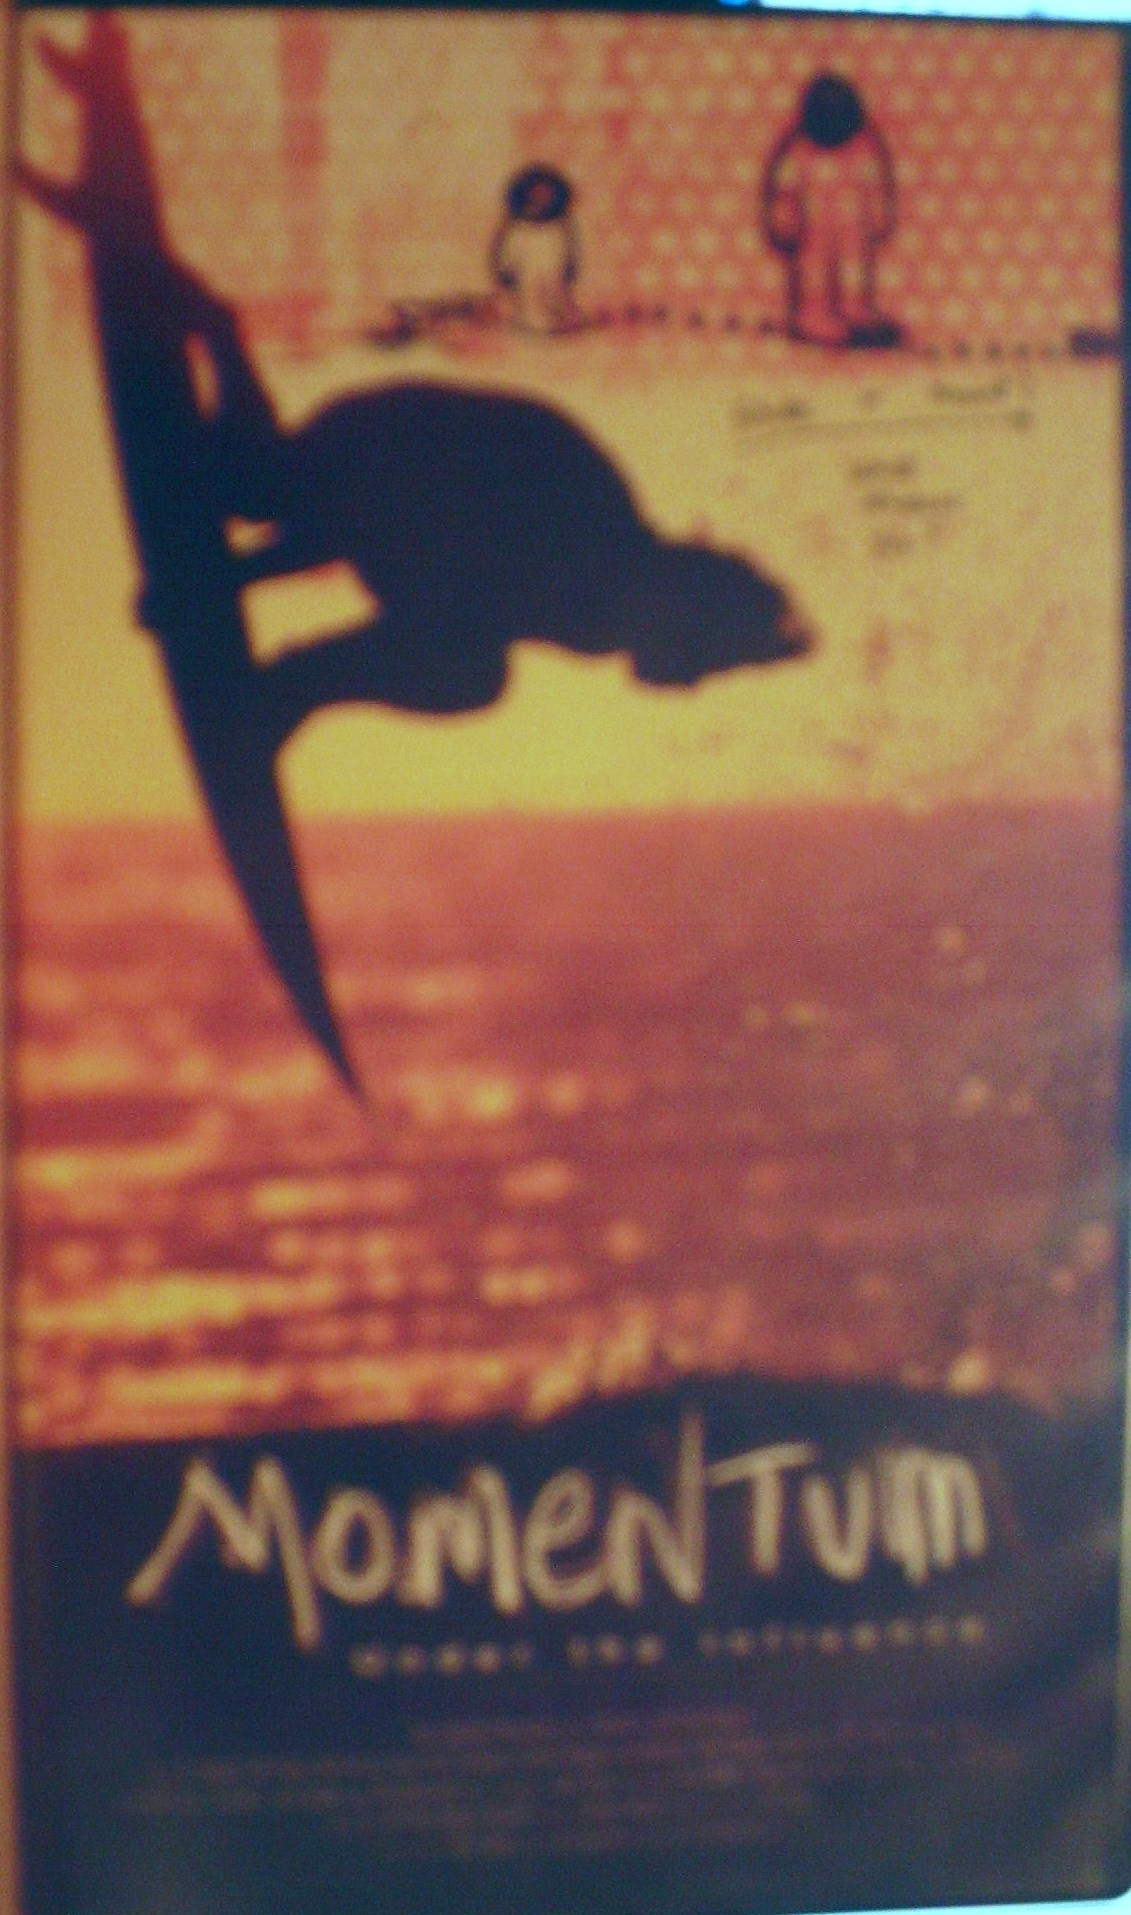 Momentum 2001 Film Wikipedia